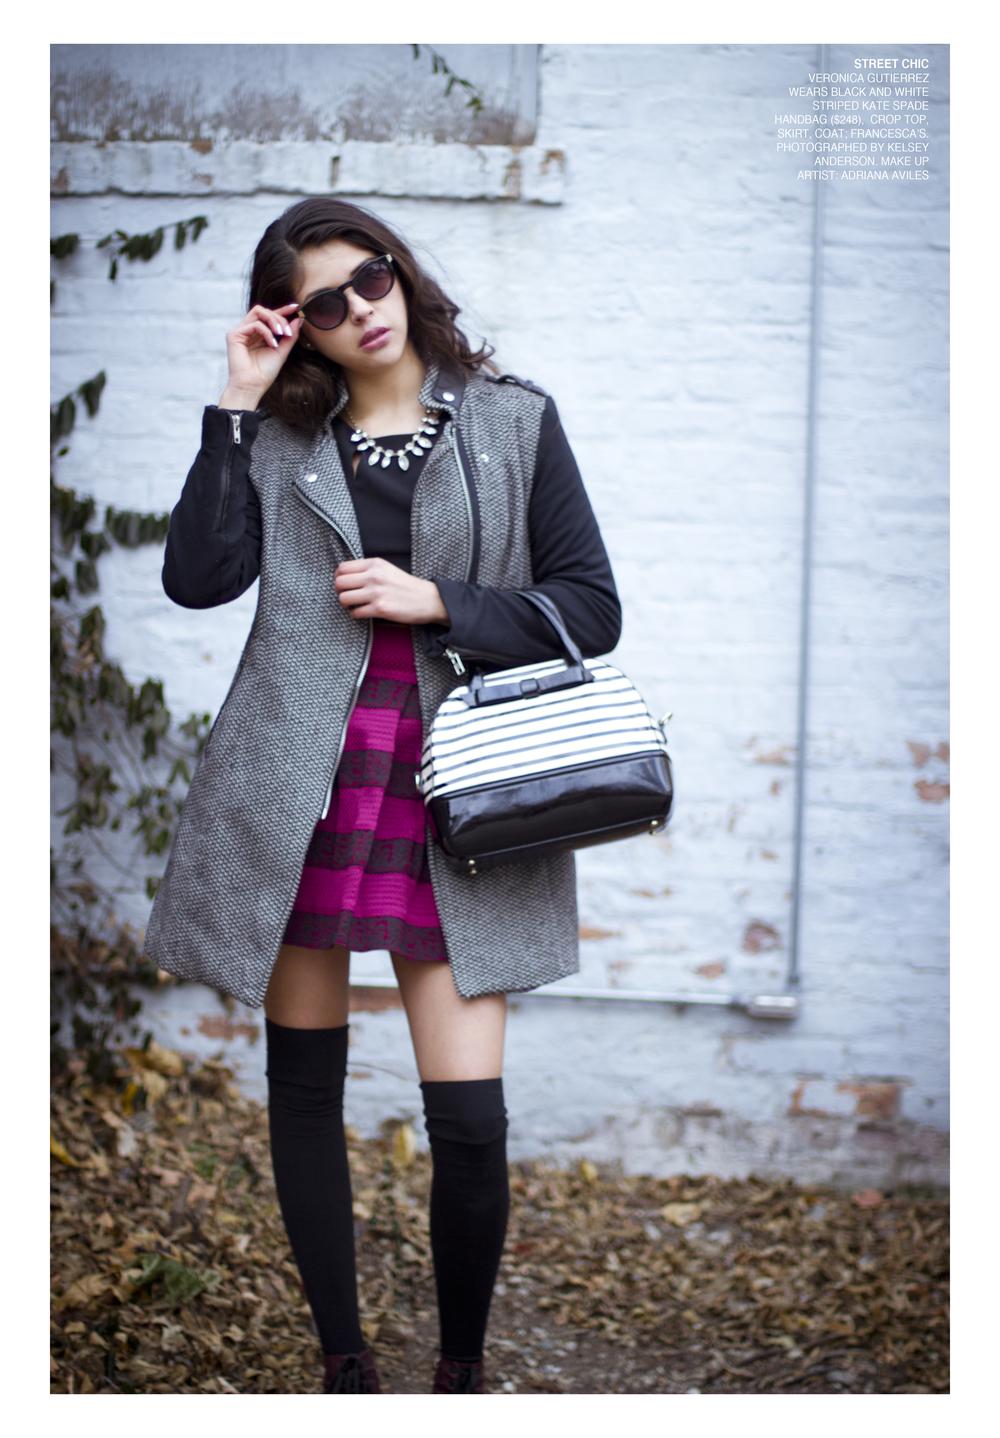 Model // Veronica Gutierrez MUA //Adriana Aviles Photographer // Kelsey Alyse Anderson